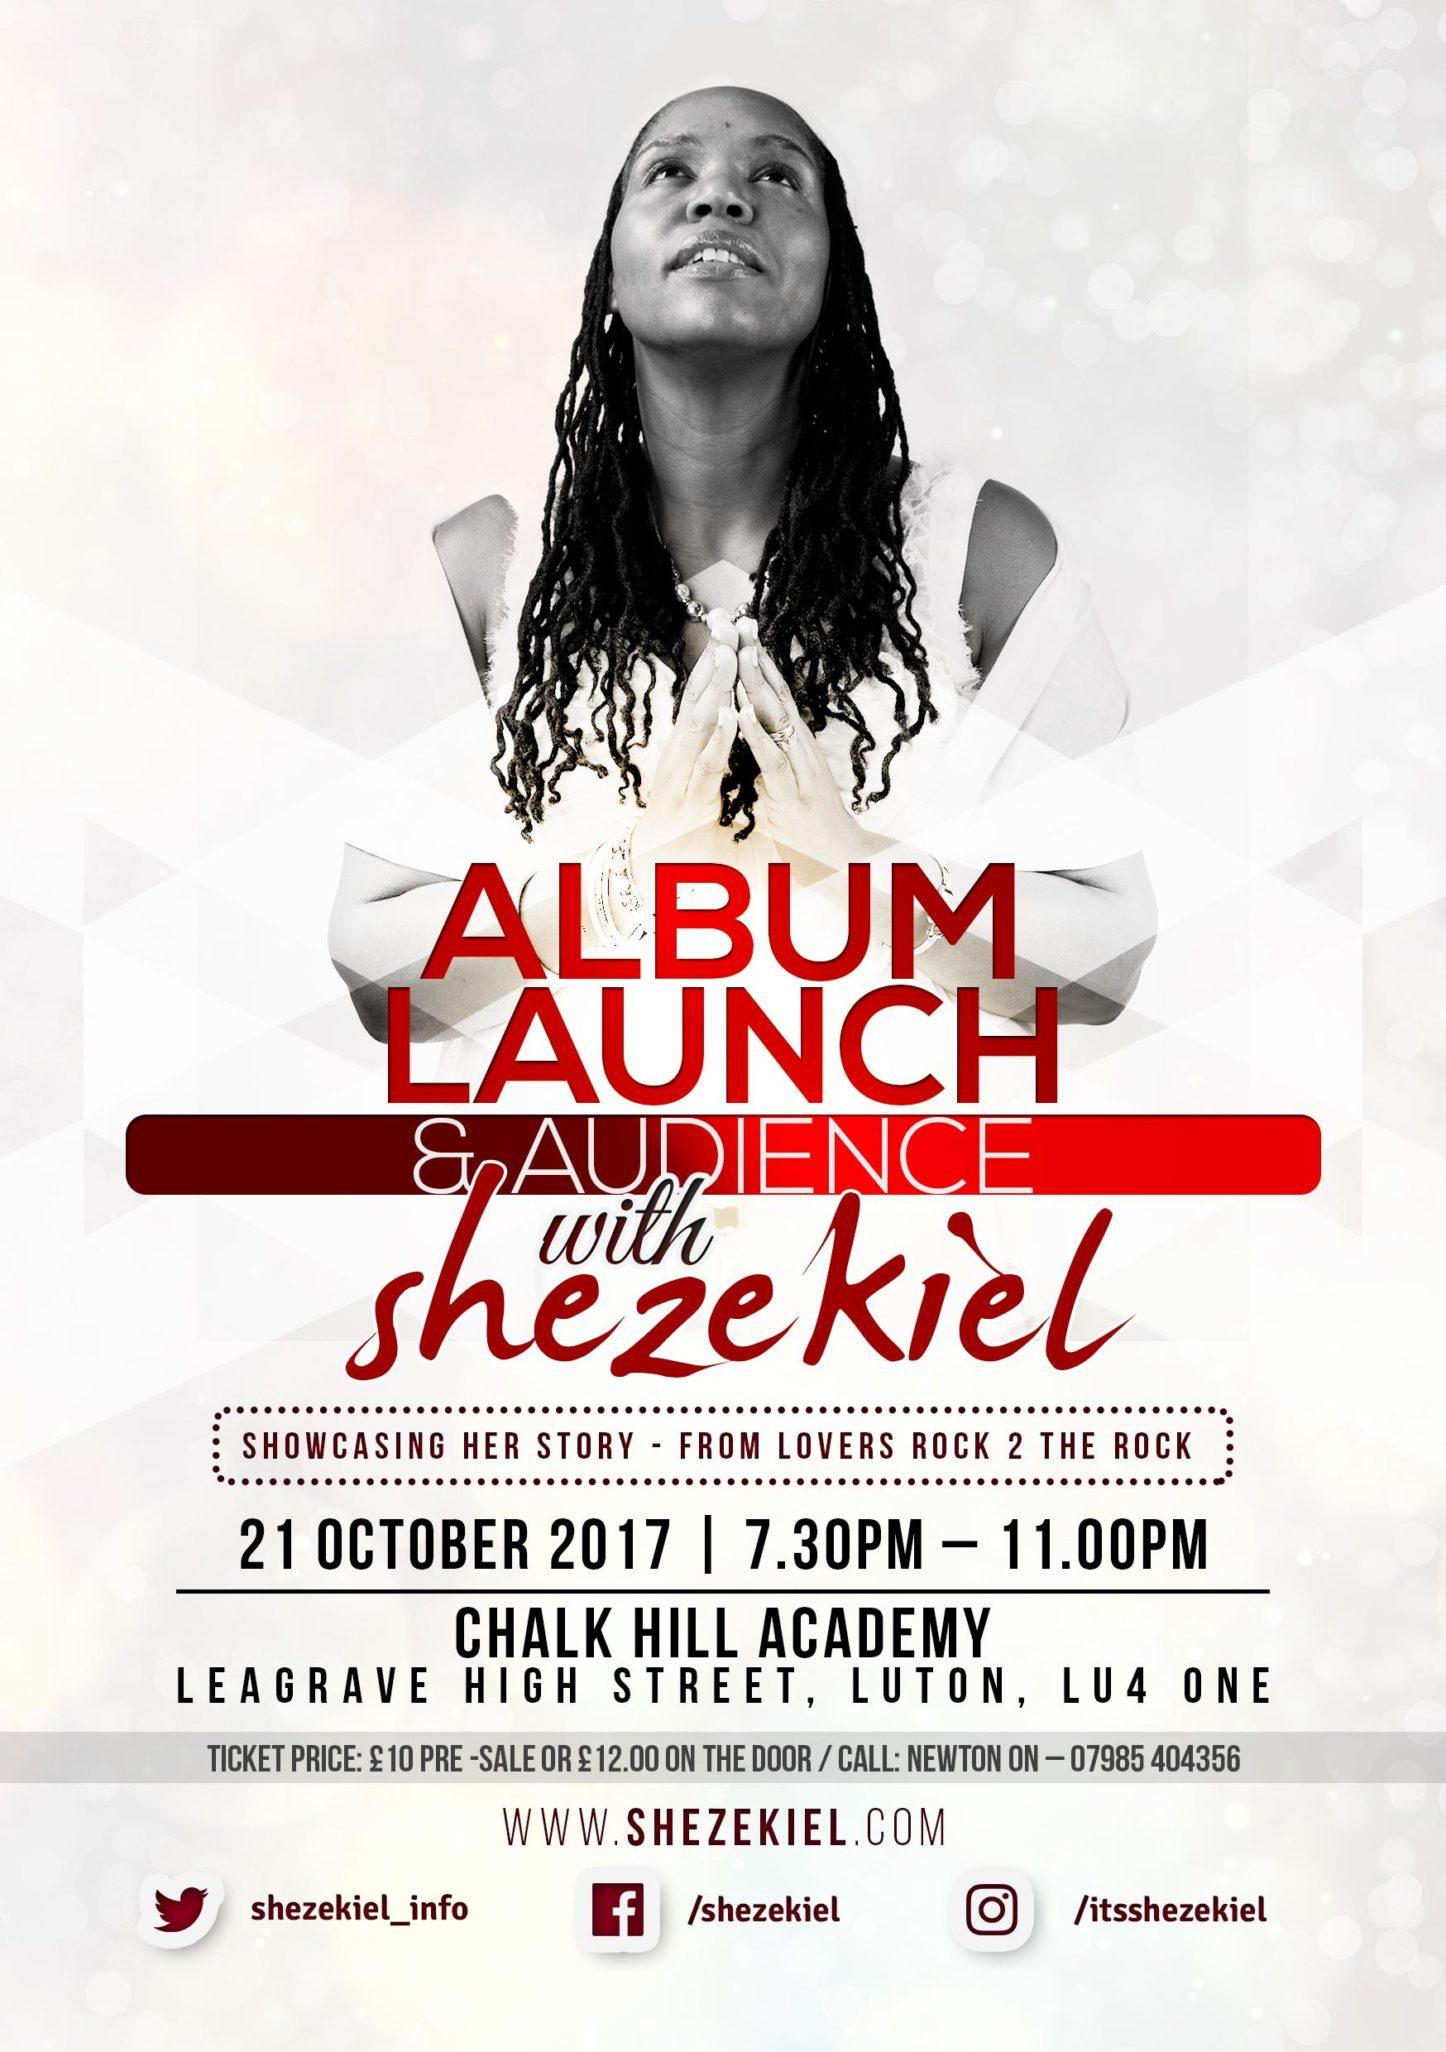 Album Launch & Audience with Shezekiel | Blacknet UK